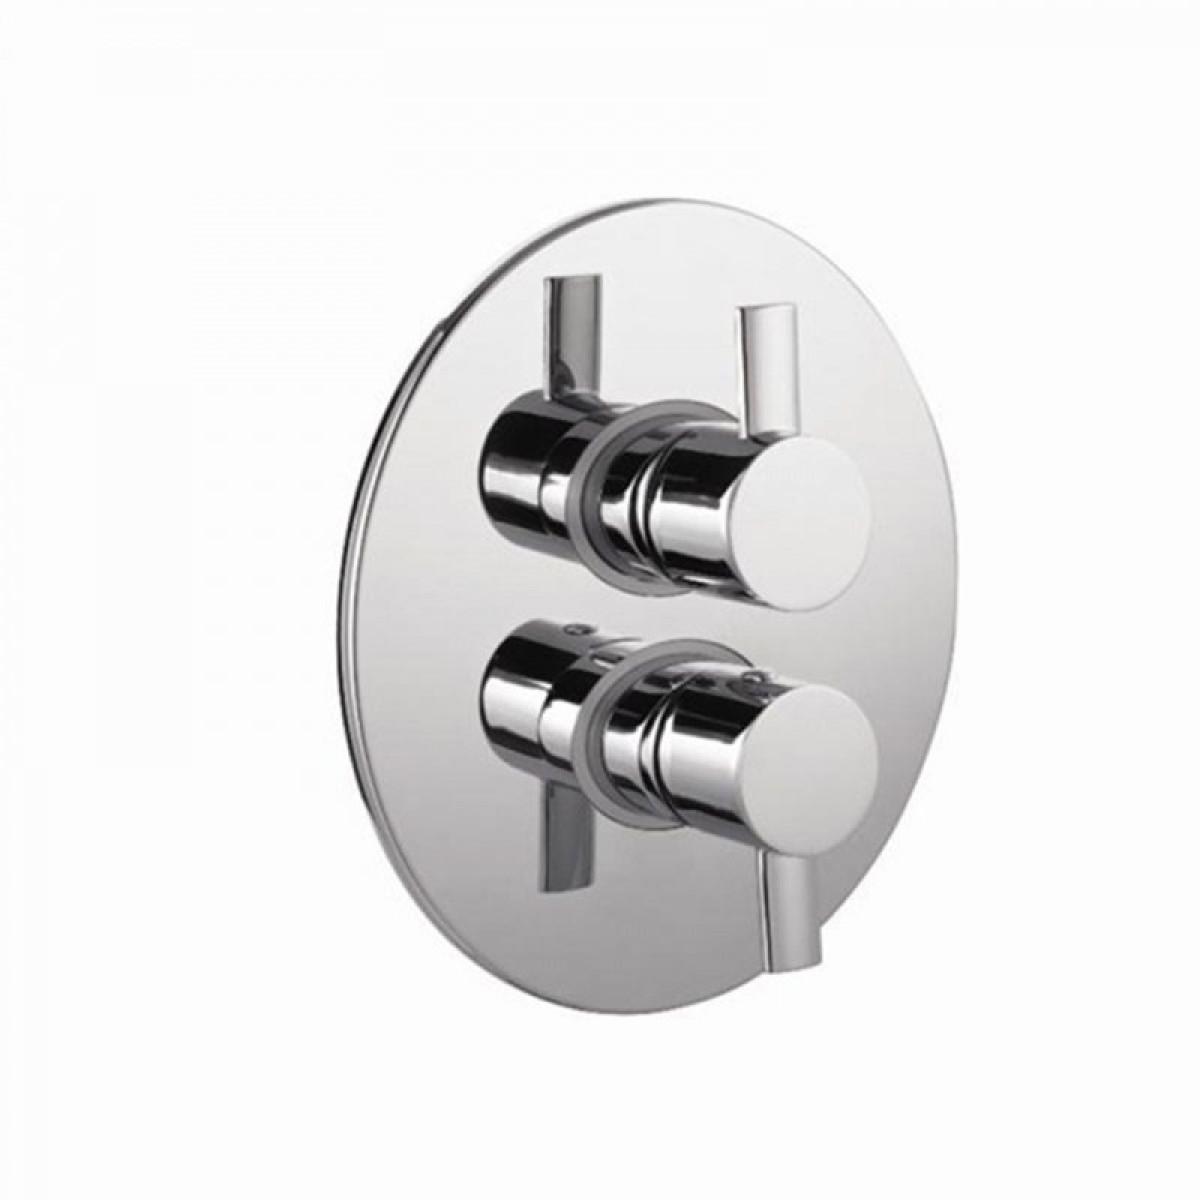 Thermostatic shower valve with 2 way diverter thorfire flashlight